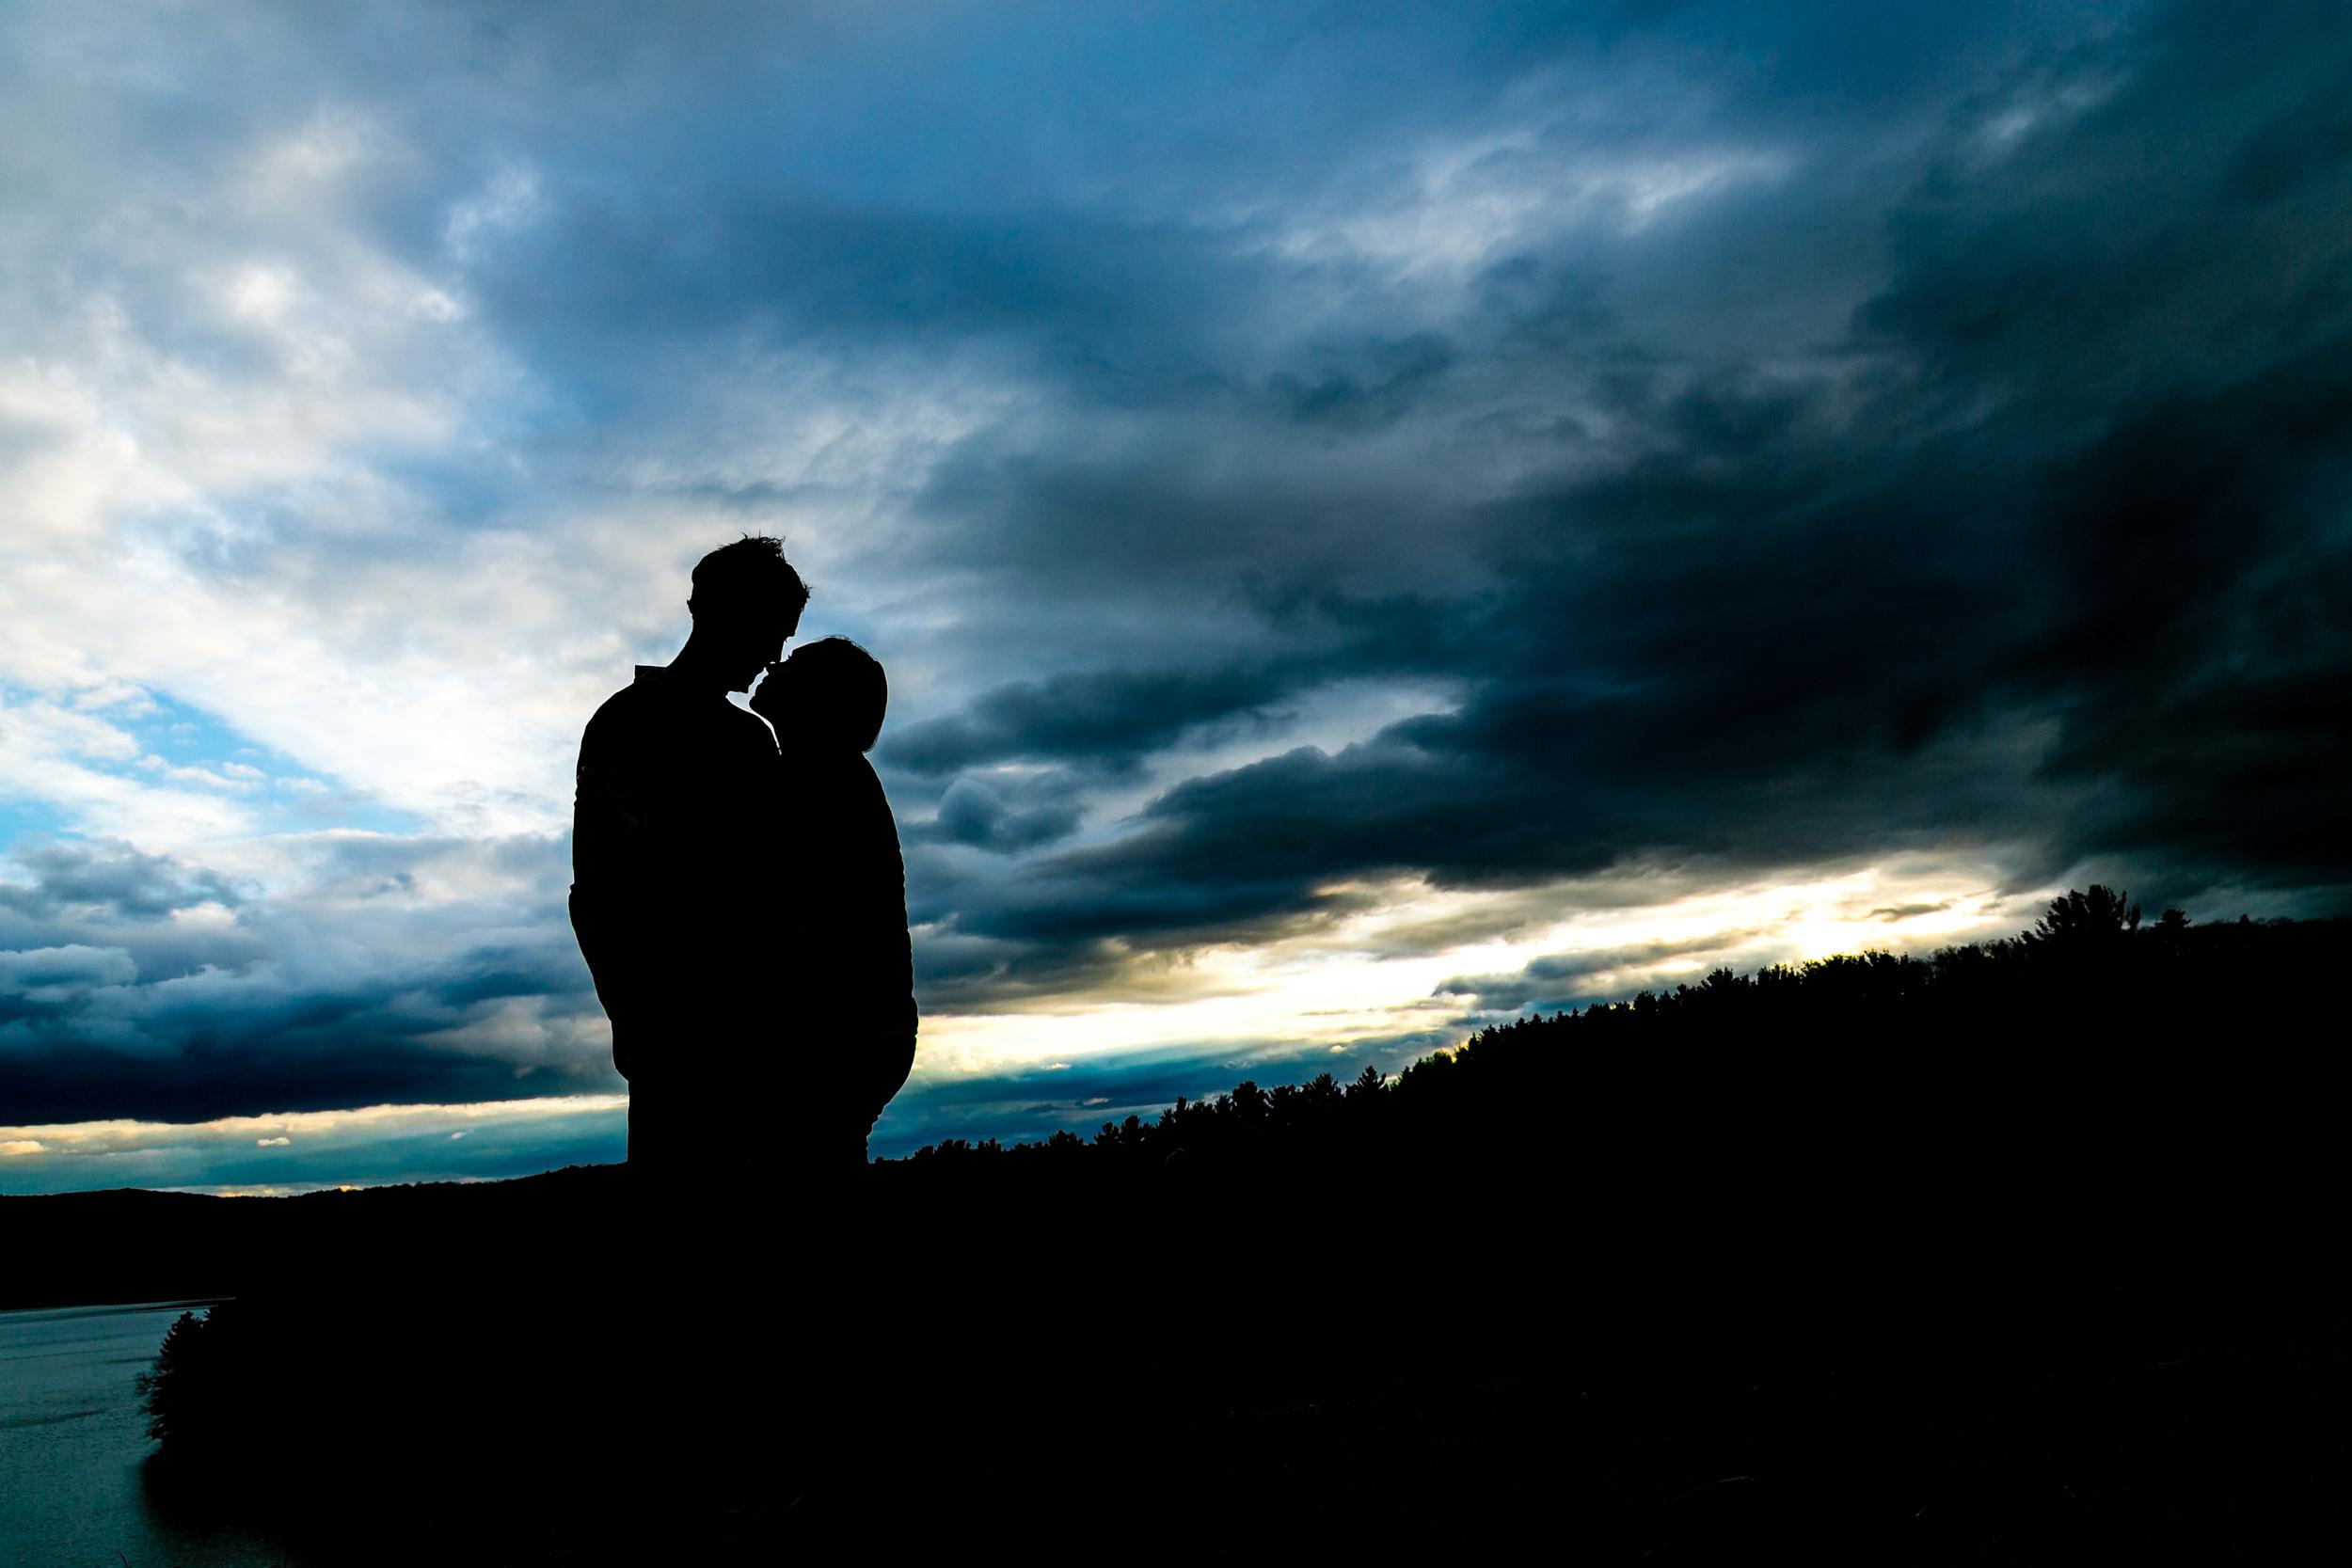 Romantic-Engagement-Poto-Session-Photography-by-Jacek-Dolata-CT-MA-RI-NJ-NYC-NY-VT-NH-PA-4.jpg